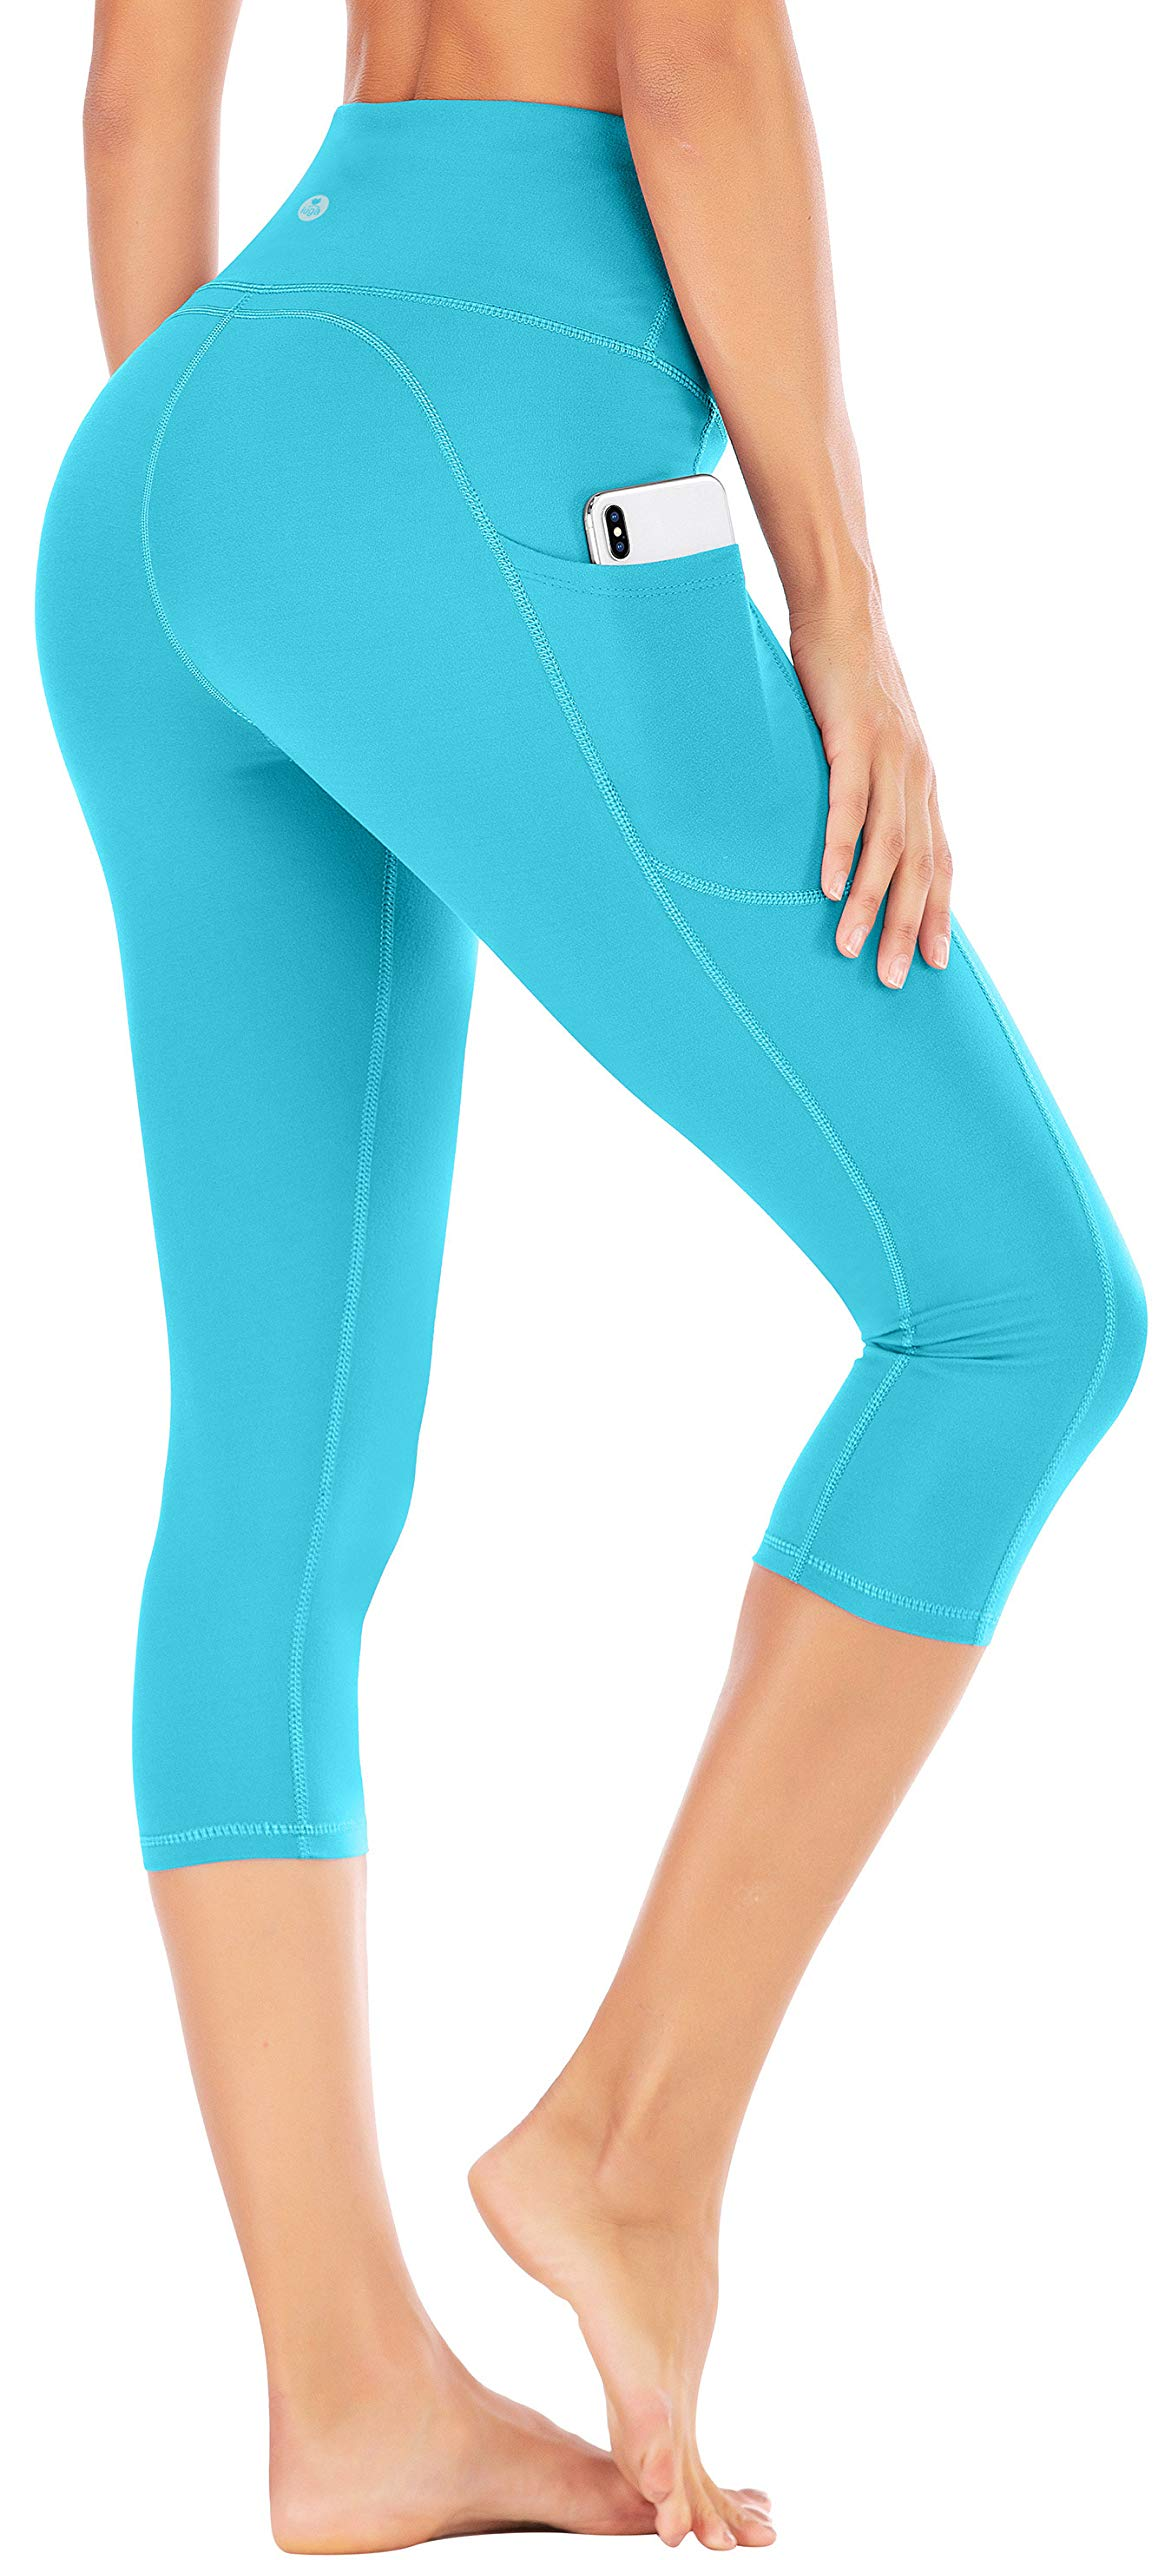 IUGA High Waist Yoga Pants with Pockets, Tummy Control Yoga Capris for Women, 4 Way Stretch Capri Leggings with Pockets(Light Blue, XL) by IUGA